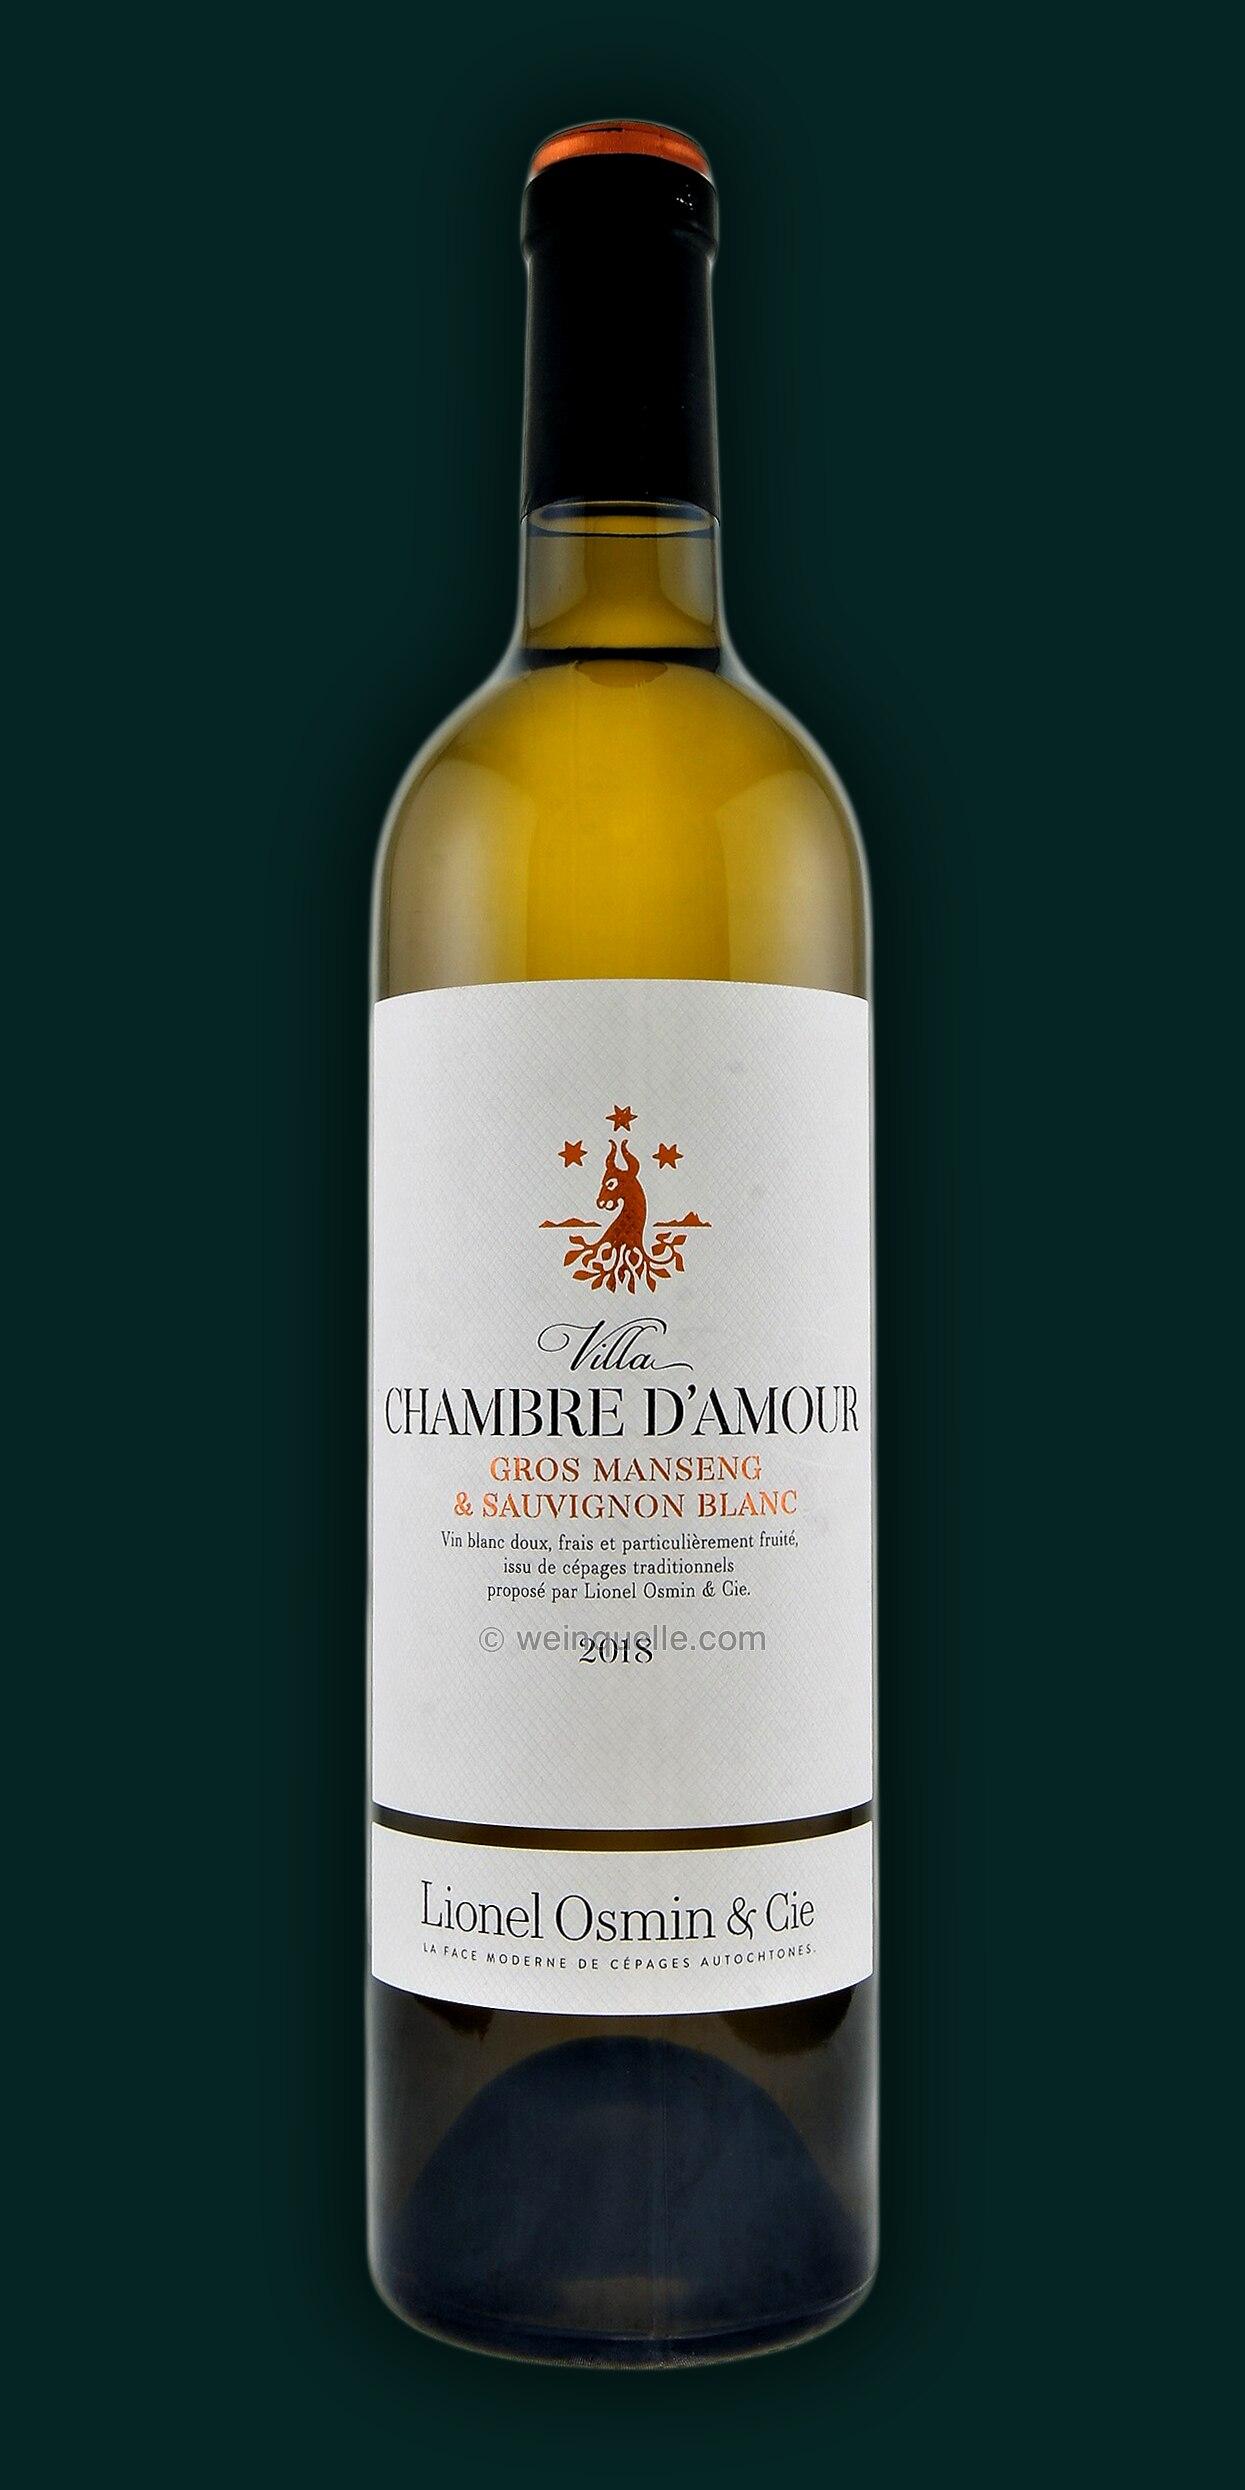 Lionel Osmin, Villa Chambre D\'Amour, Gros Manseng, Sauvignon Blanc ...